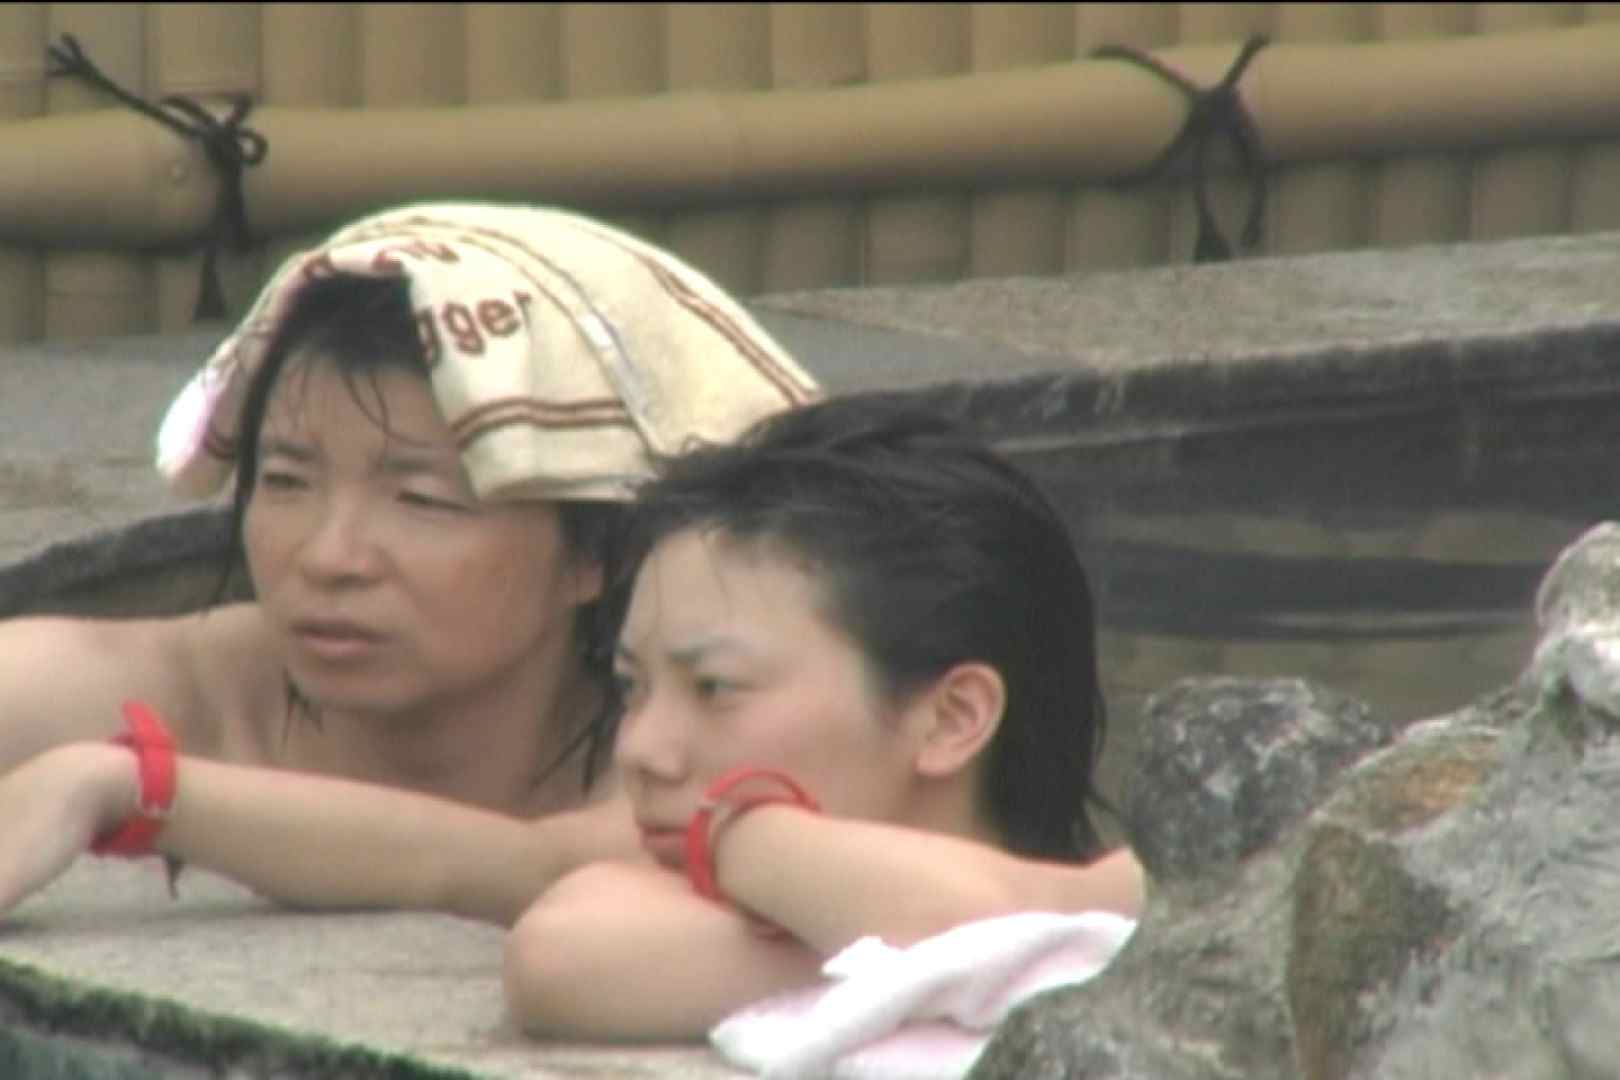 Aquaな露天風呂Vol.122 エッチな盗撮 オメコ無修正動画無料 107pic 6